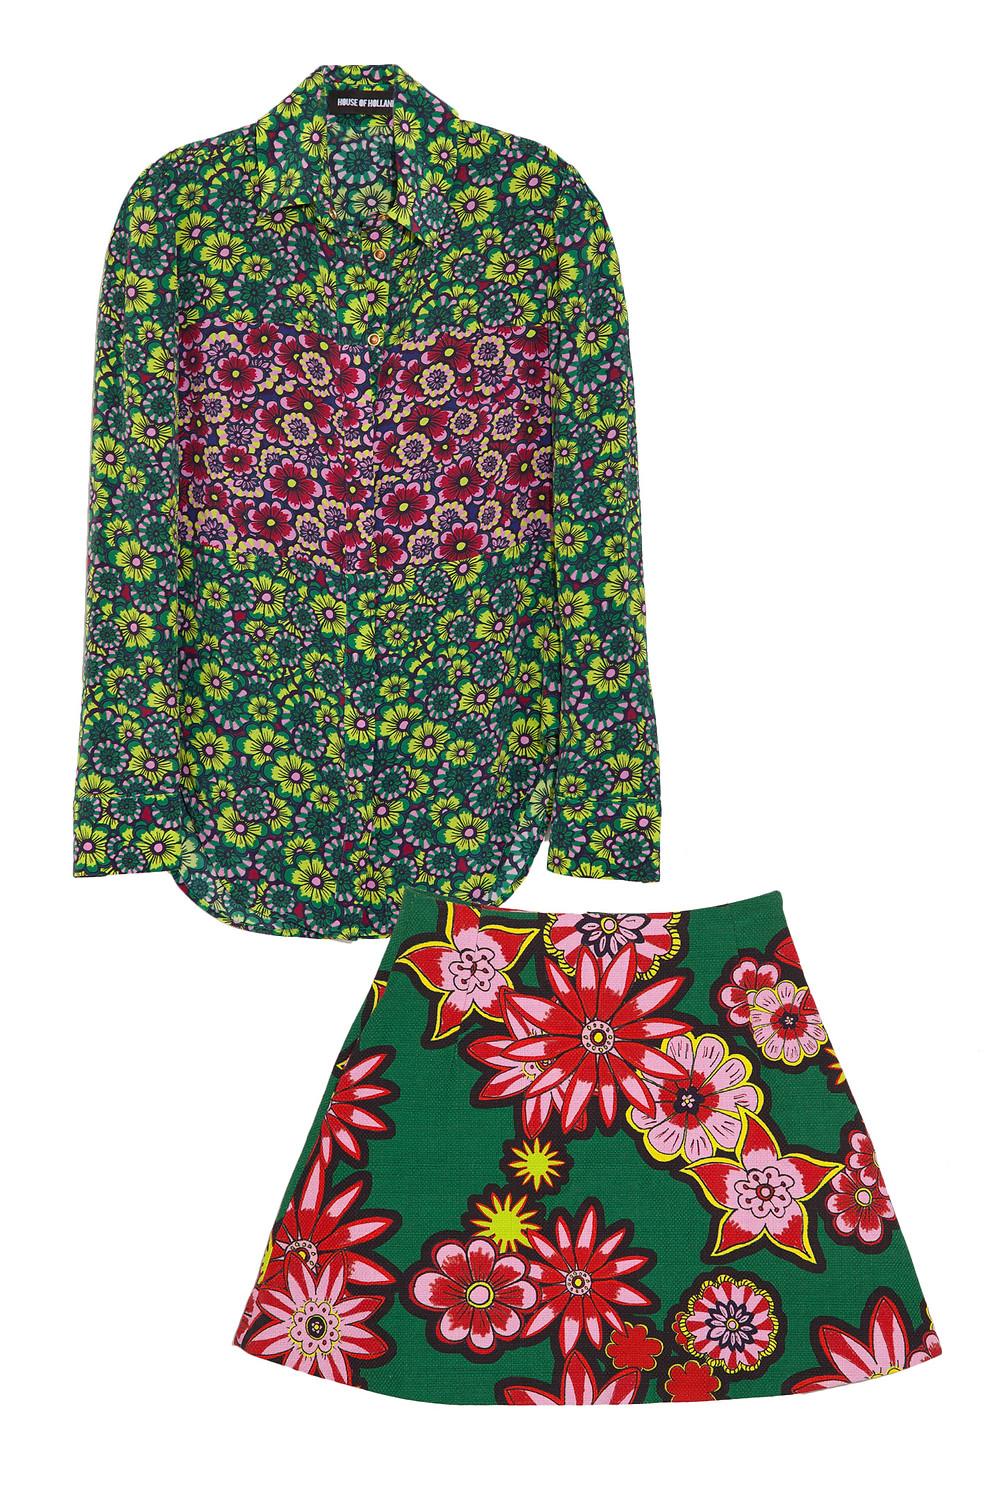 House of holland shirt $408 : skirt $310.jpg